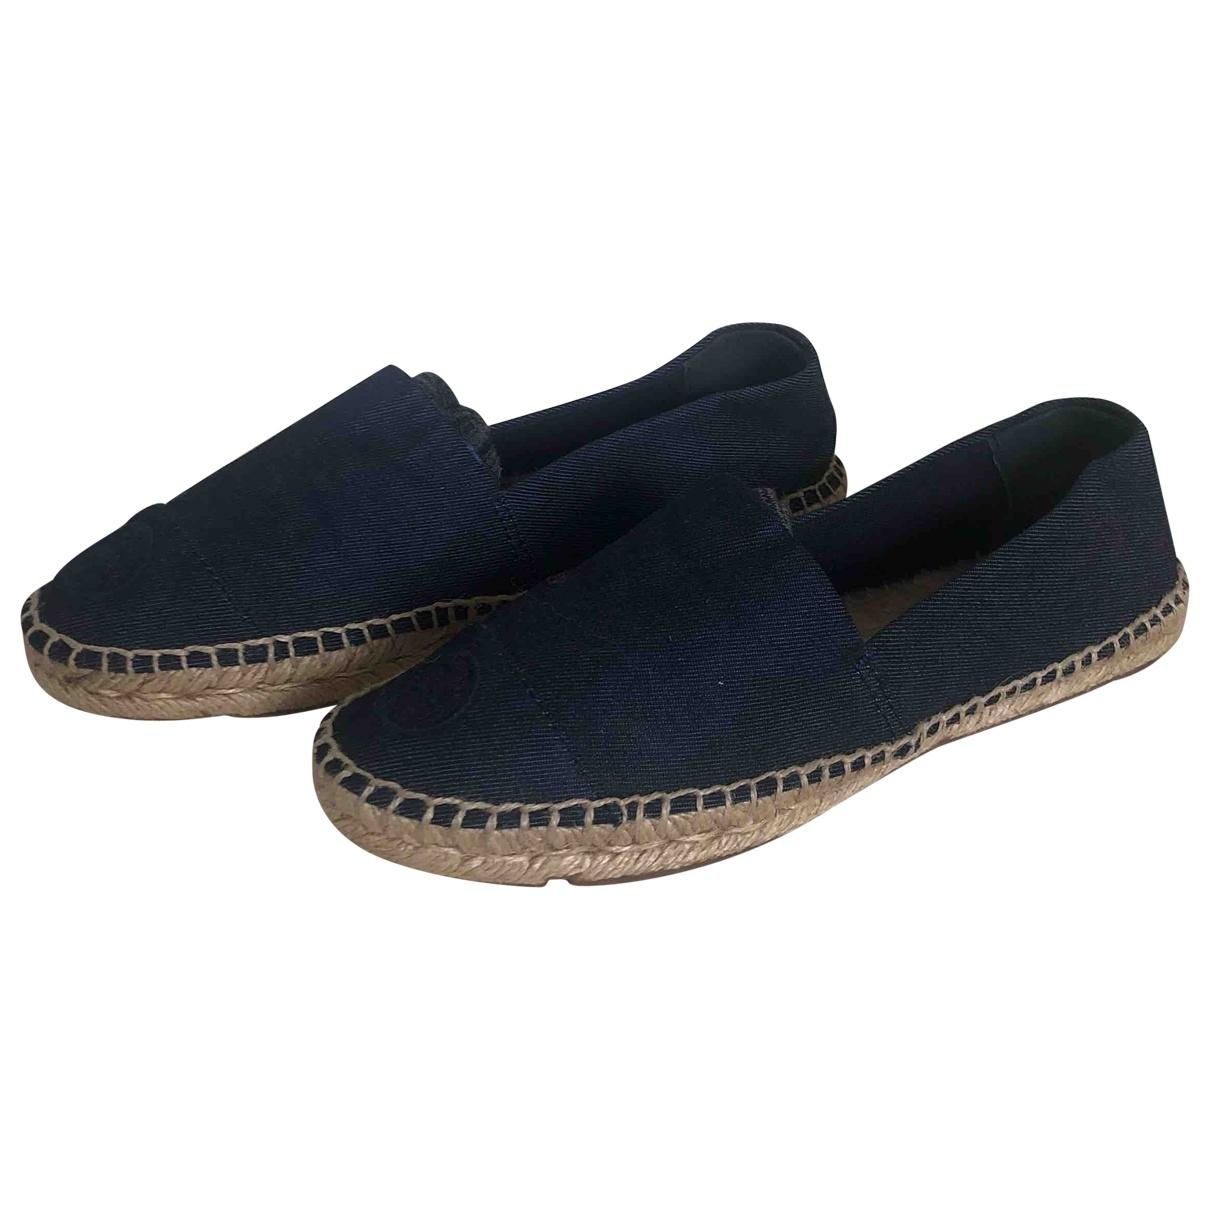 Tory Burch \N Espadrilles in  Blau Denim - Jeans